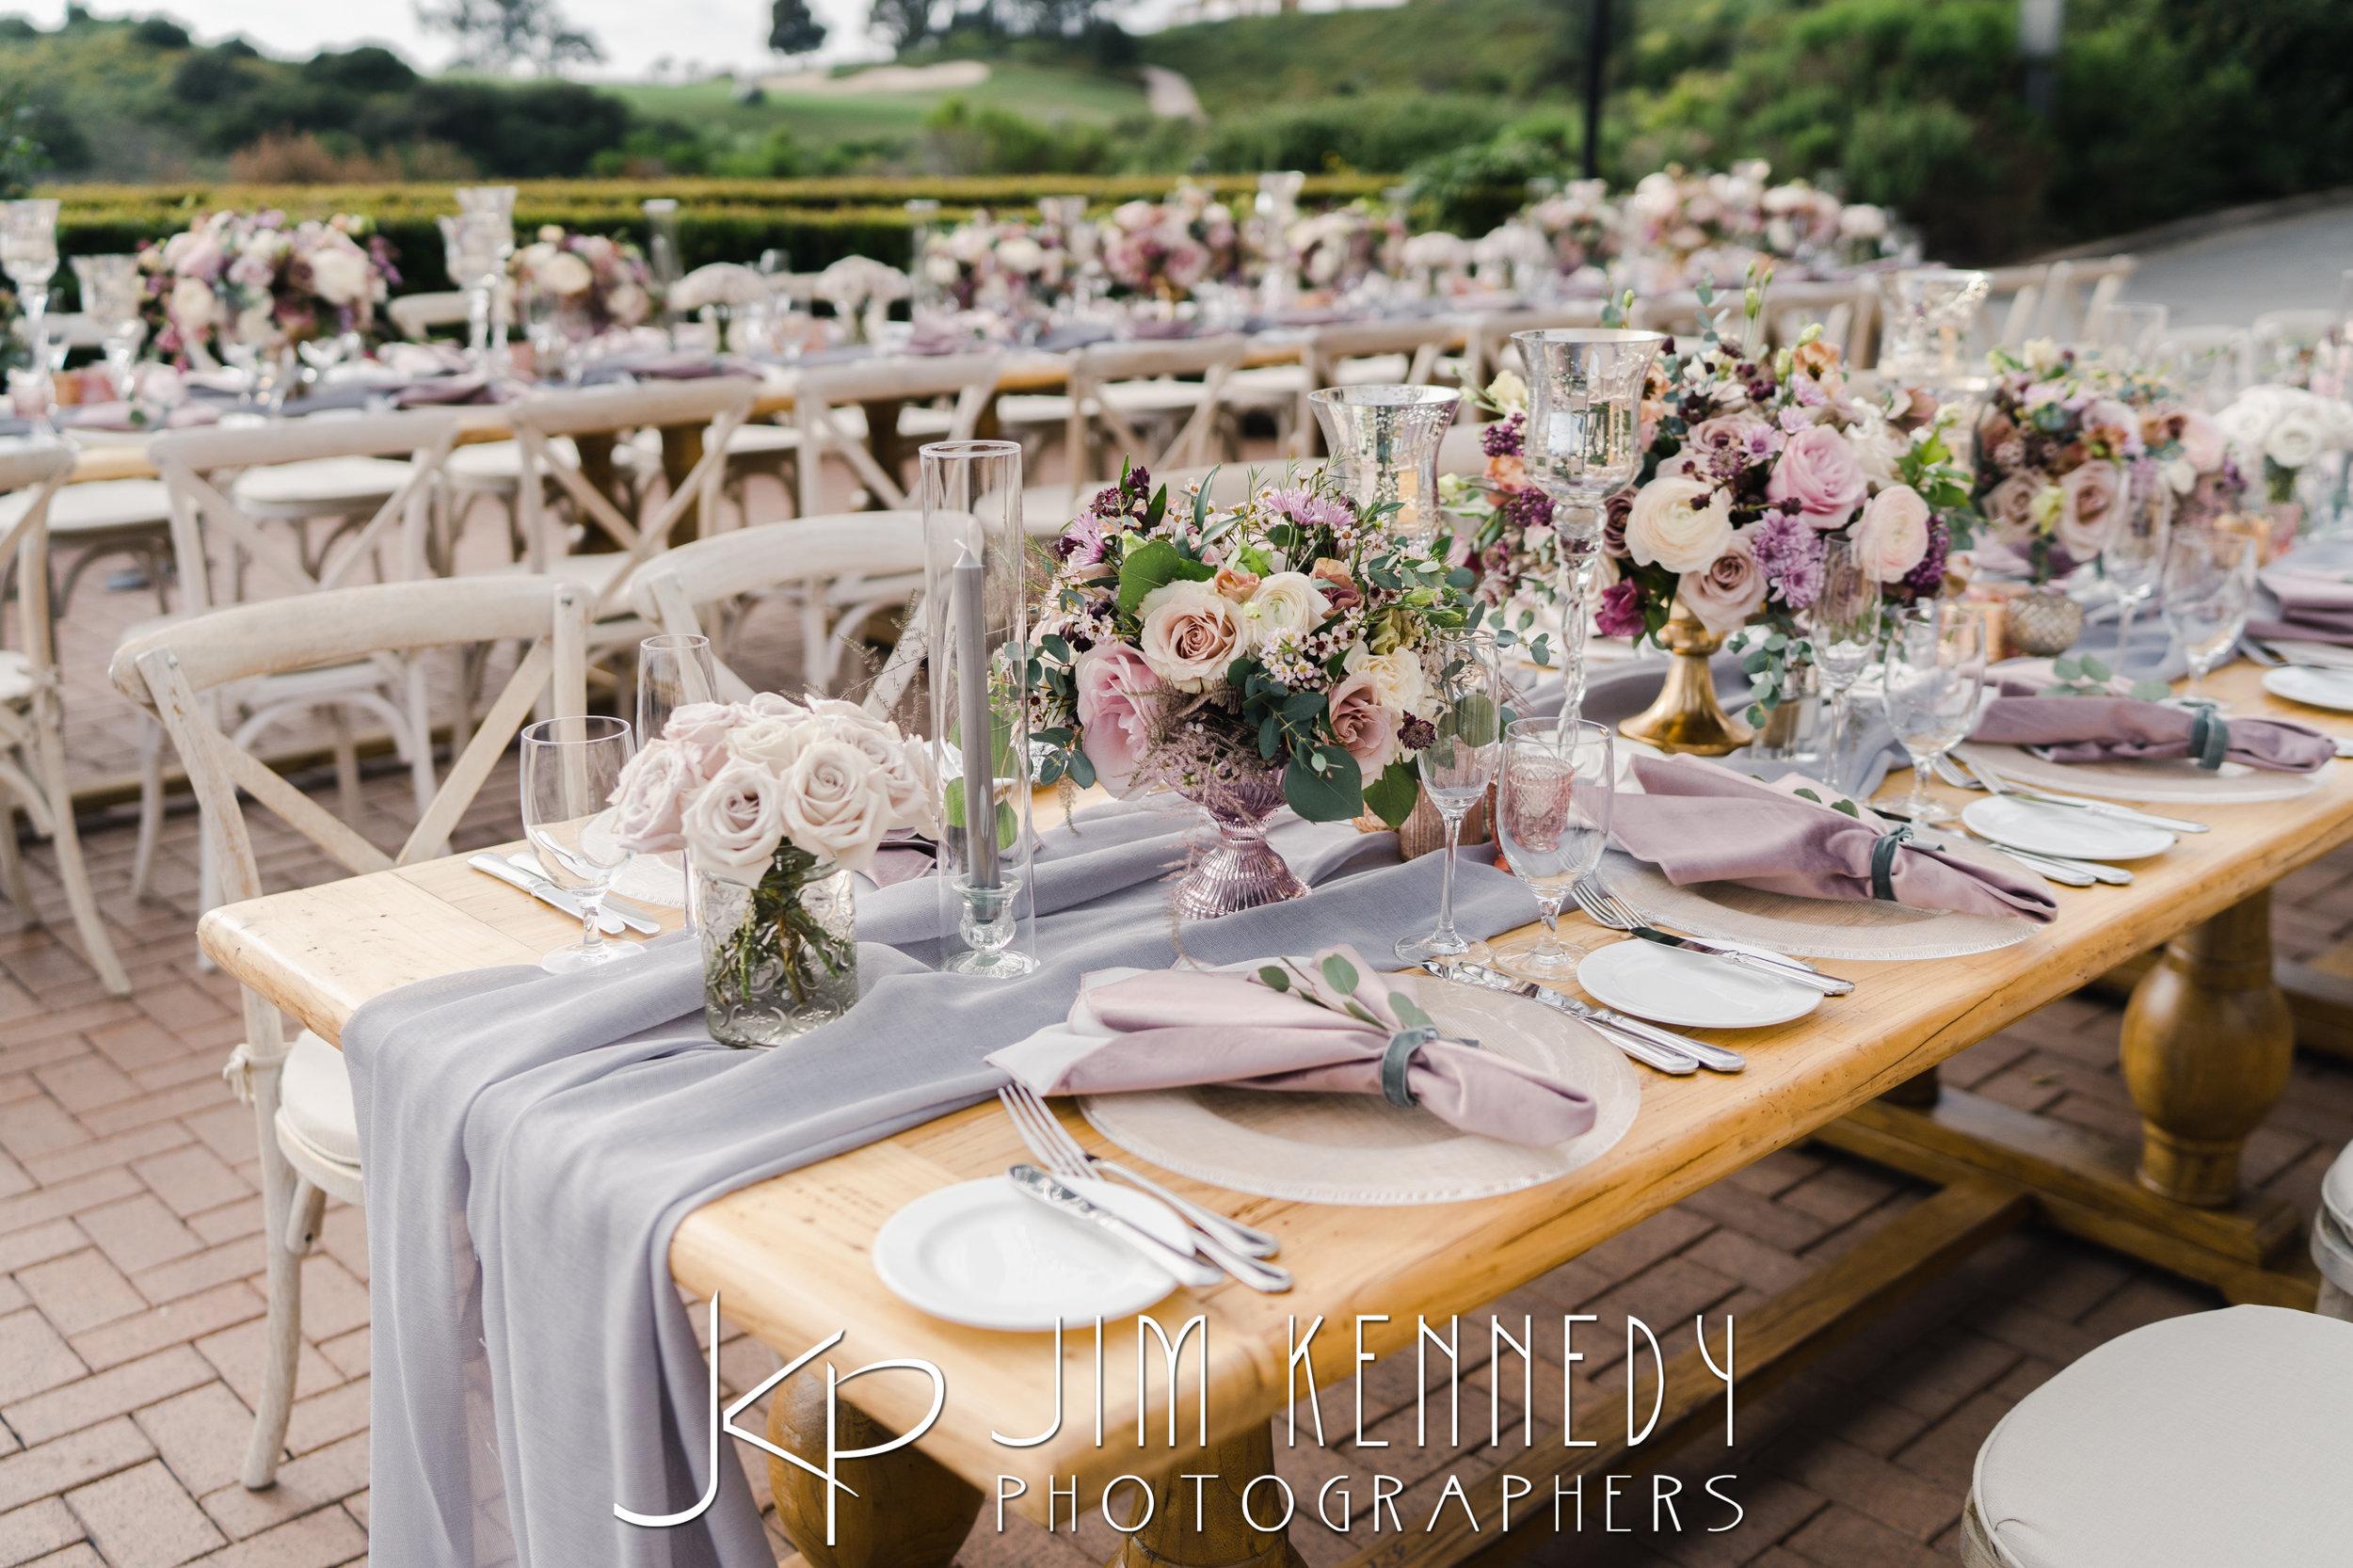 pelican-hill-wedding-jim-kenedy-photographers_0186.JPG